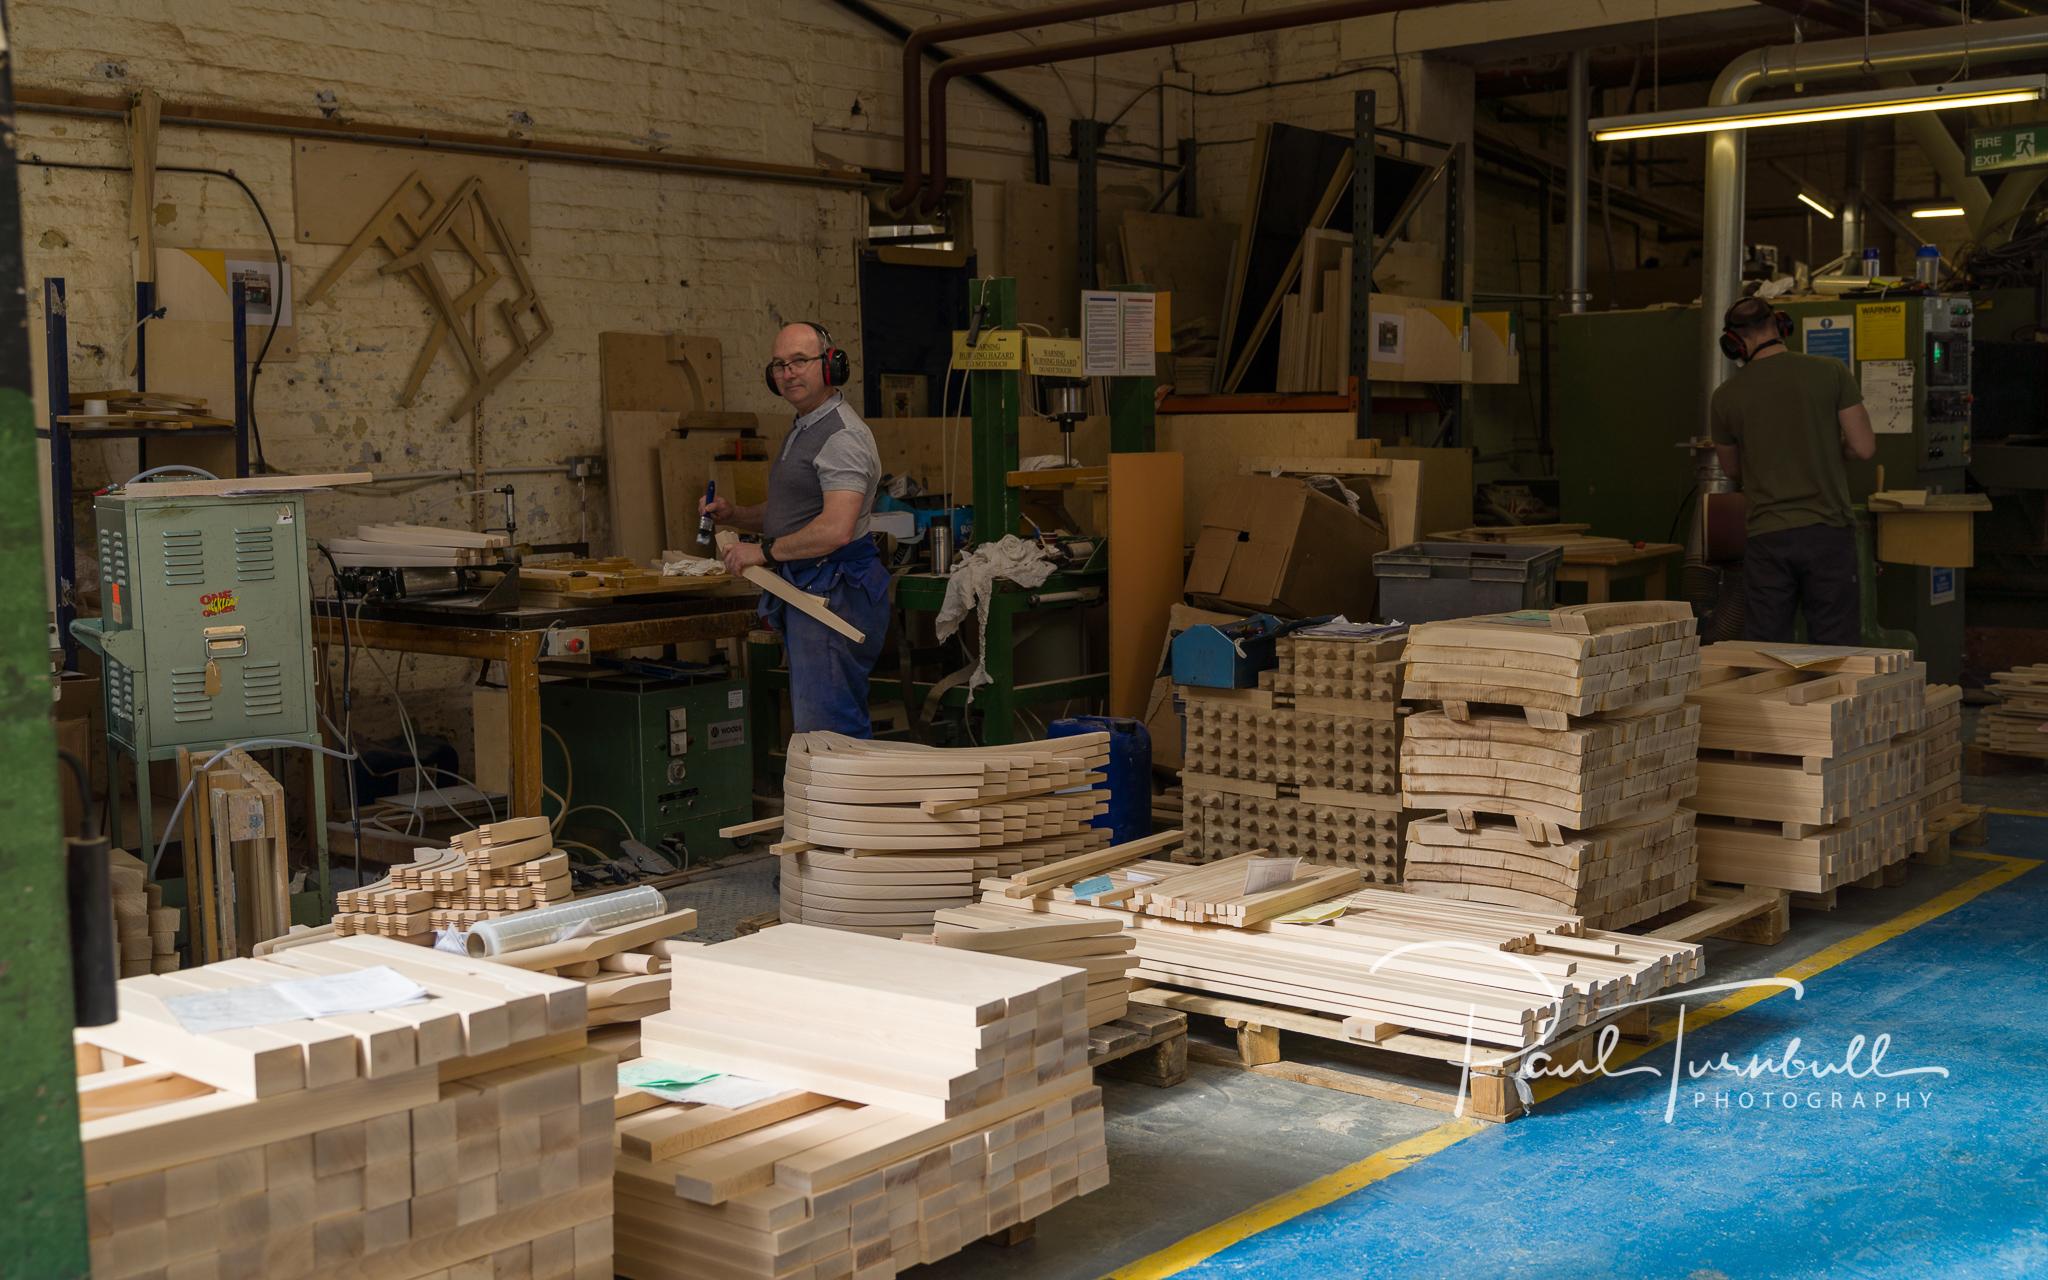 commercial-photographer-leeds-bradford-knightsbridge-furniture-tour-019.jpg